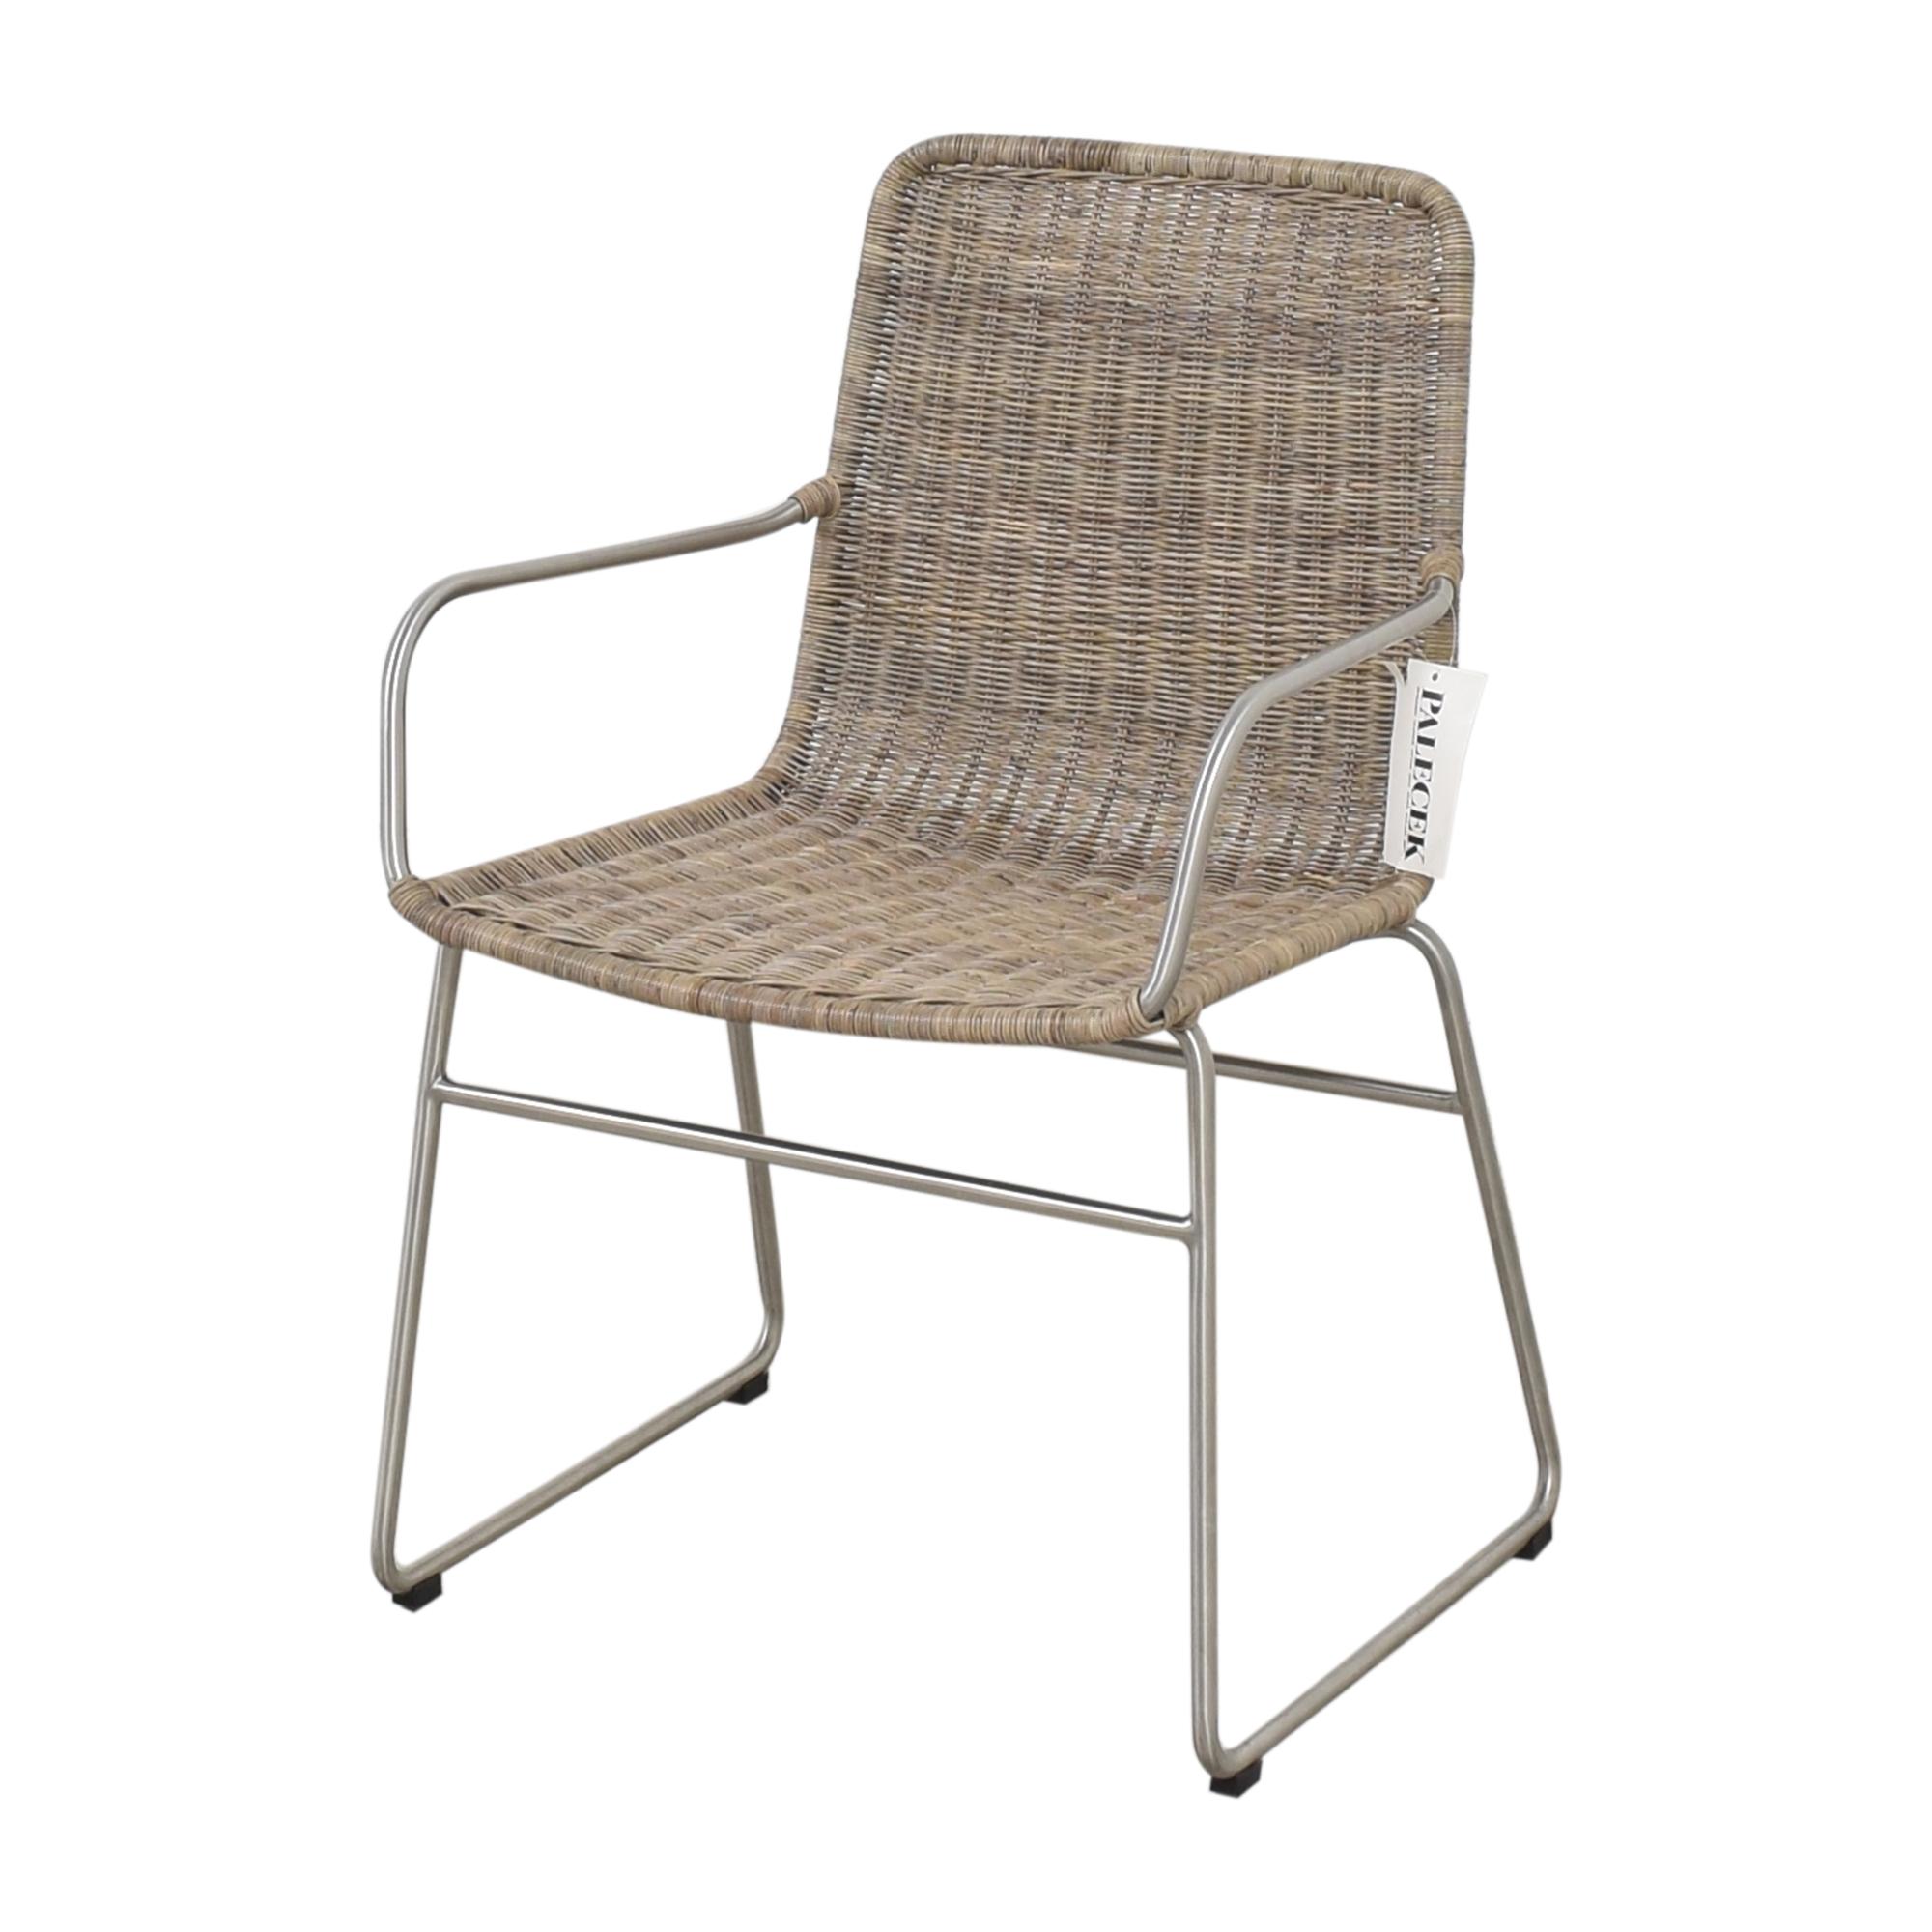 Palecek Palecek Oslo Arm Chair price